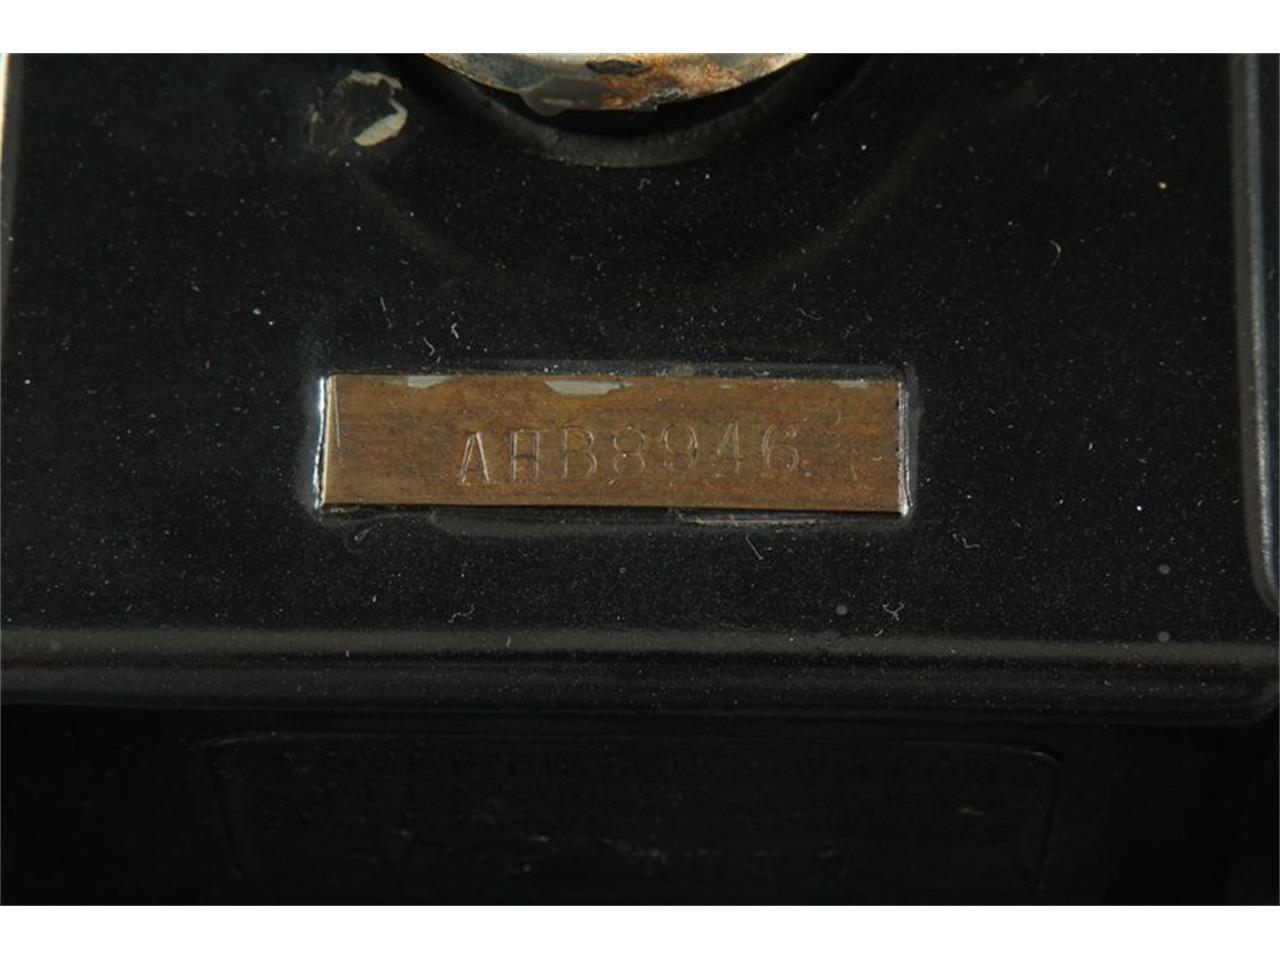 1960 Austin-Healey 3000 Mark I BN7 (CC-1358098) for sale in Elyria, Ohio